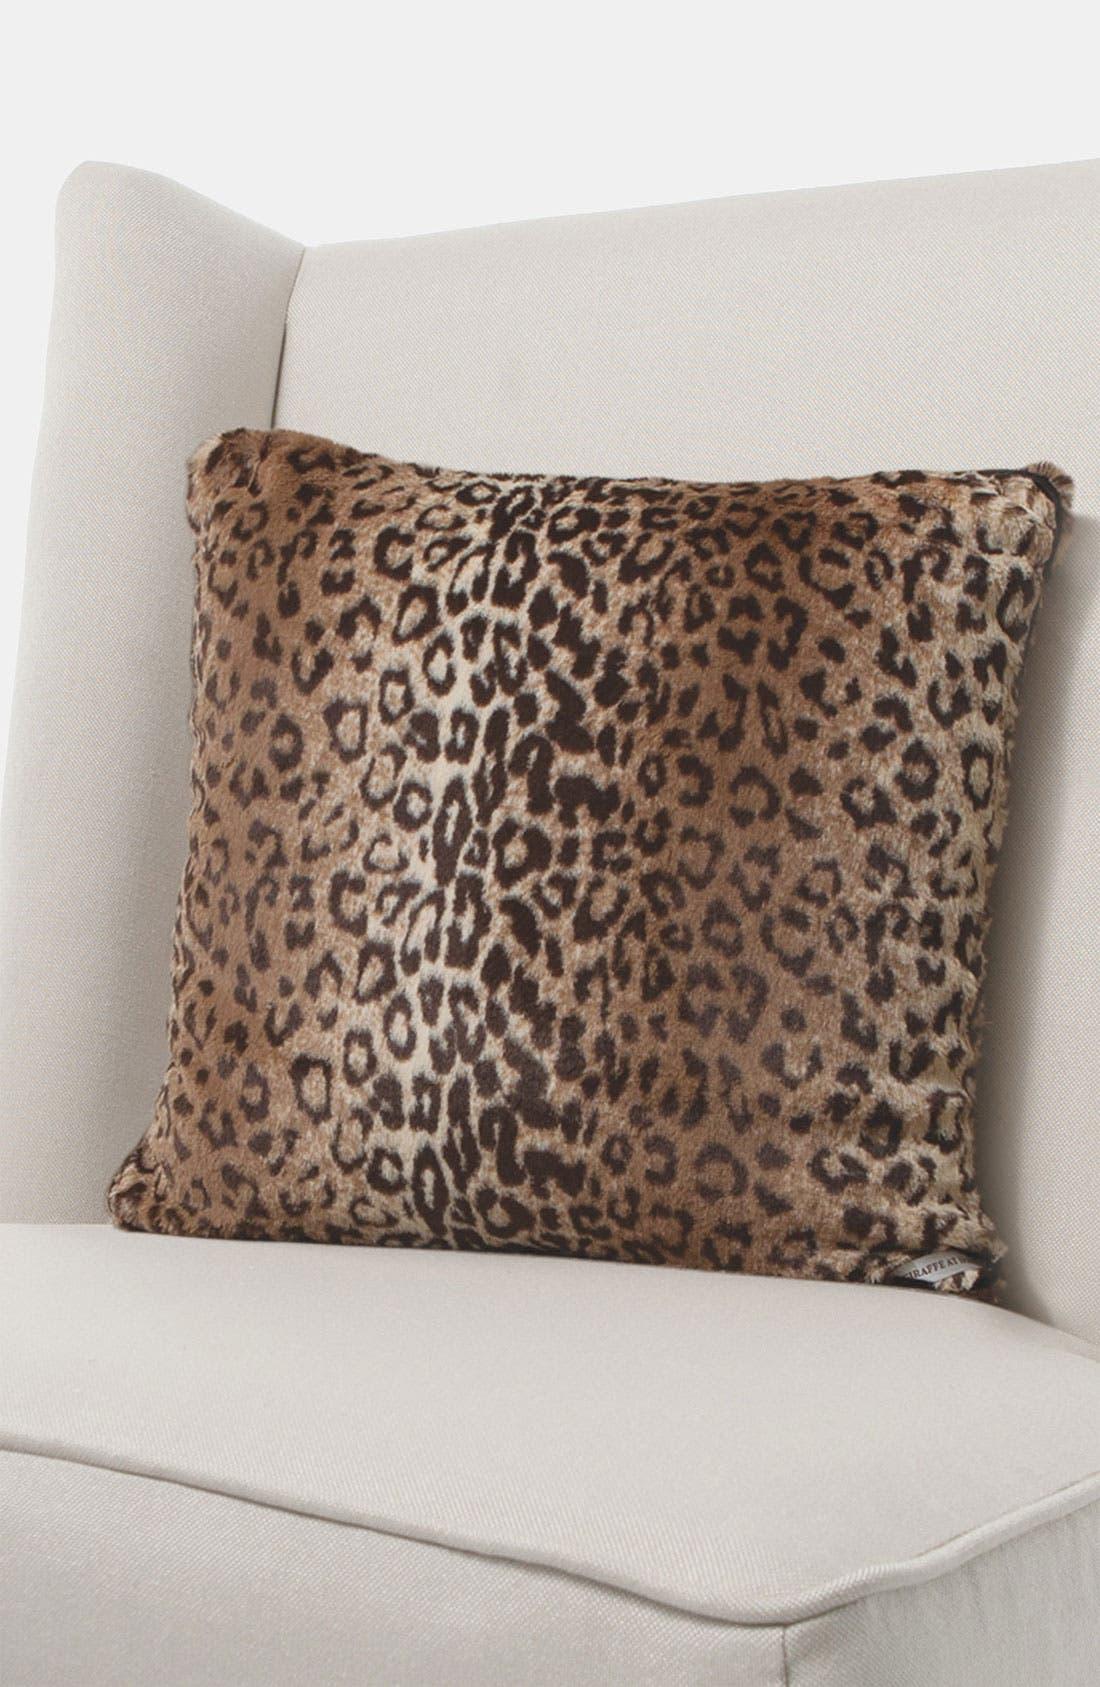 Giraffe at Home 'Luxe Leopard' Throw Pillow (Online Only)